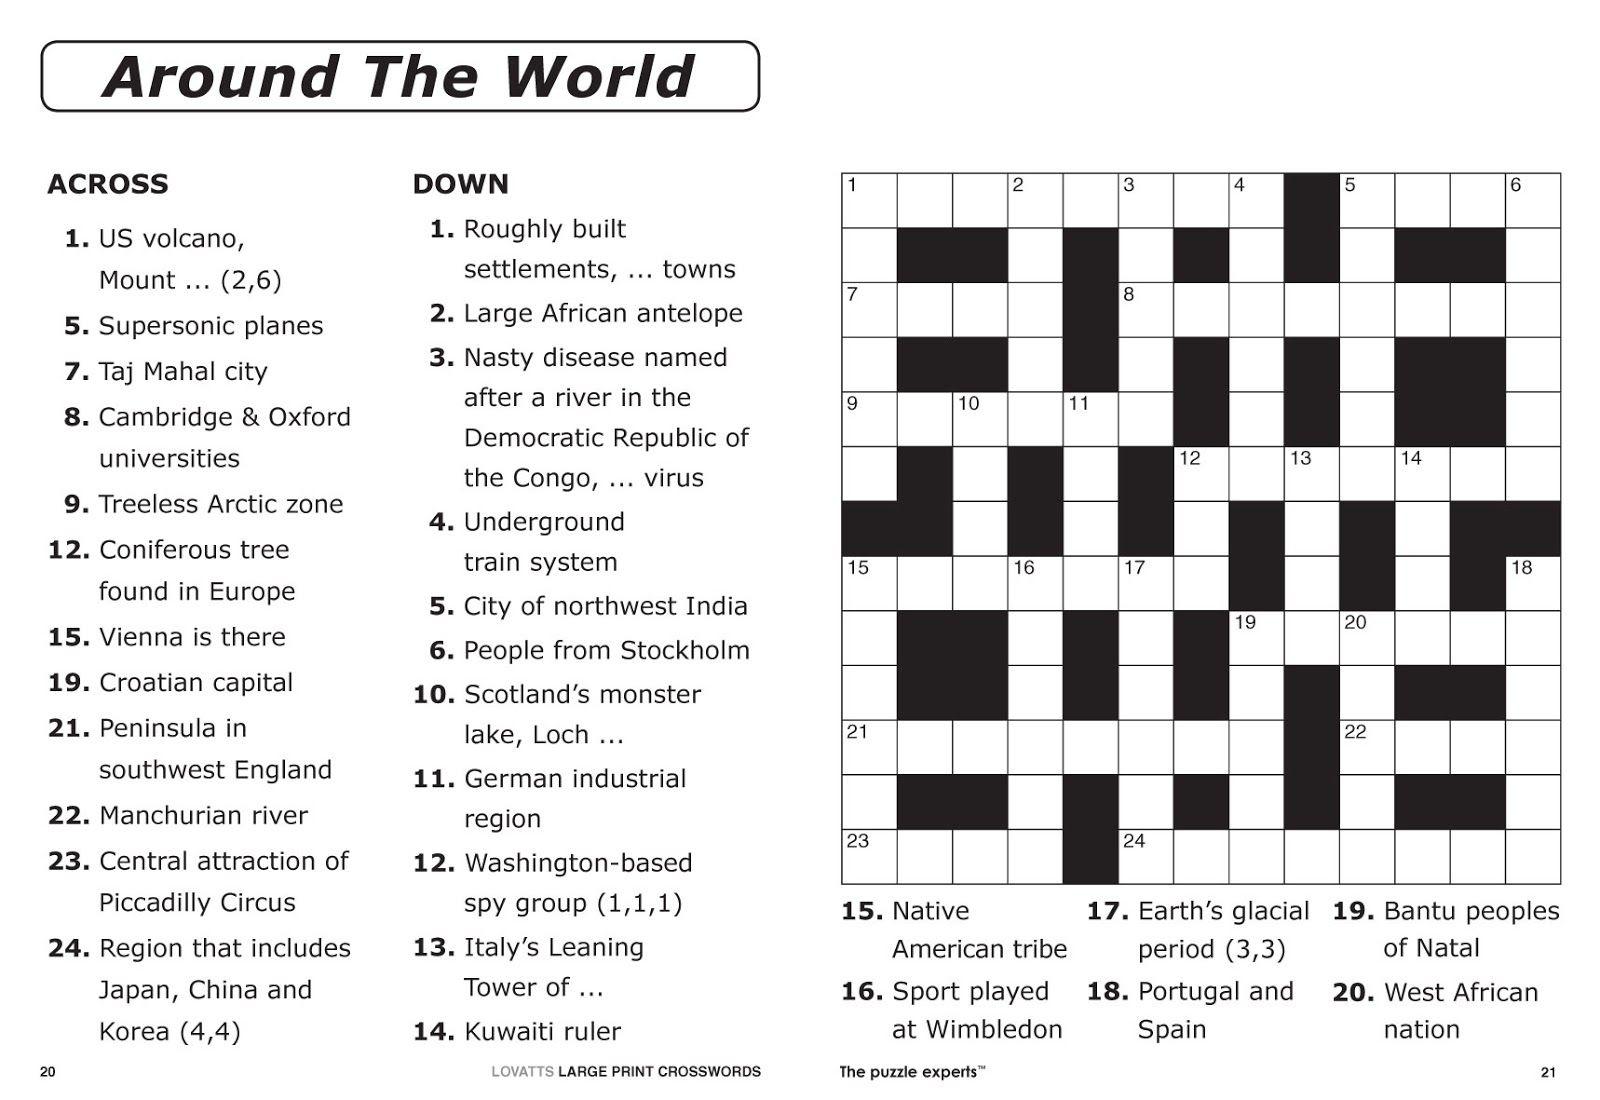 Free Printable Large Print Crossword Puzzles | M3U8 - Printable Crossword Puzzles For 9 Year Olds